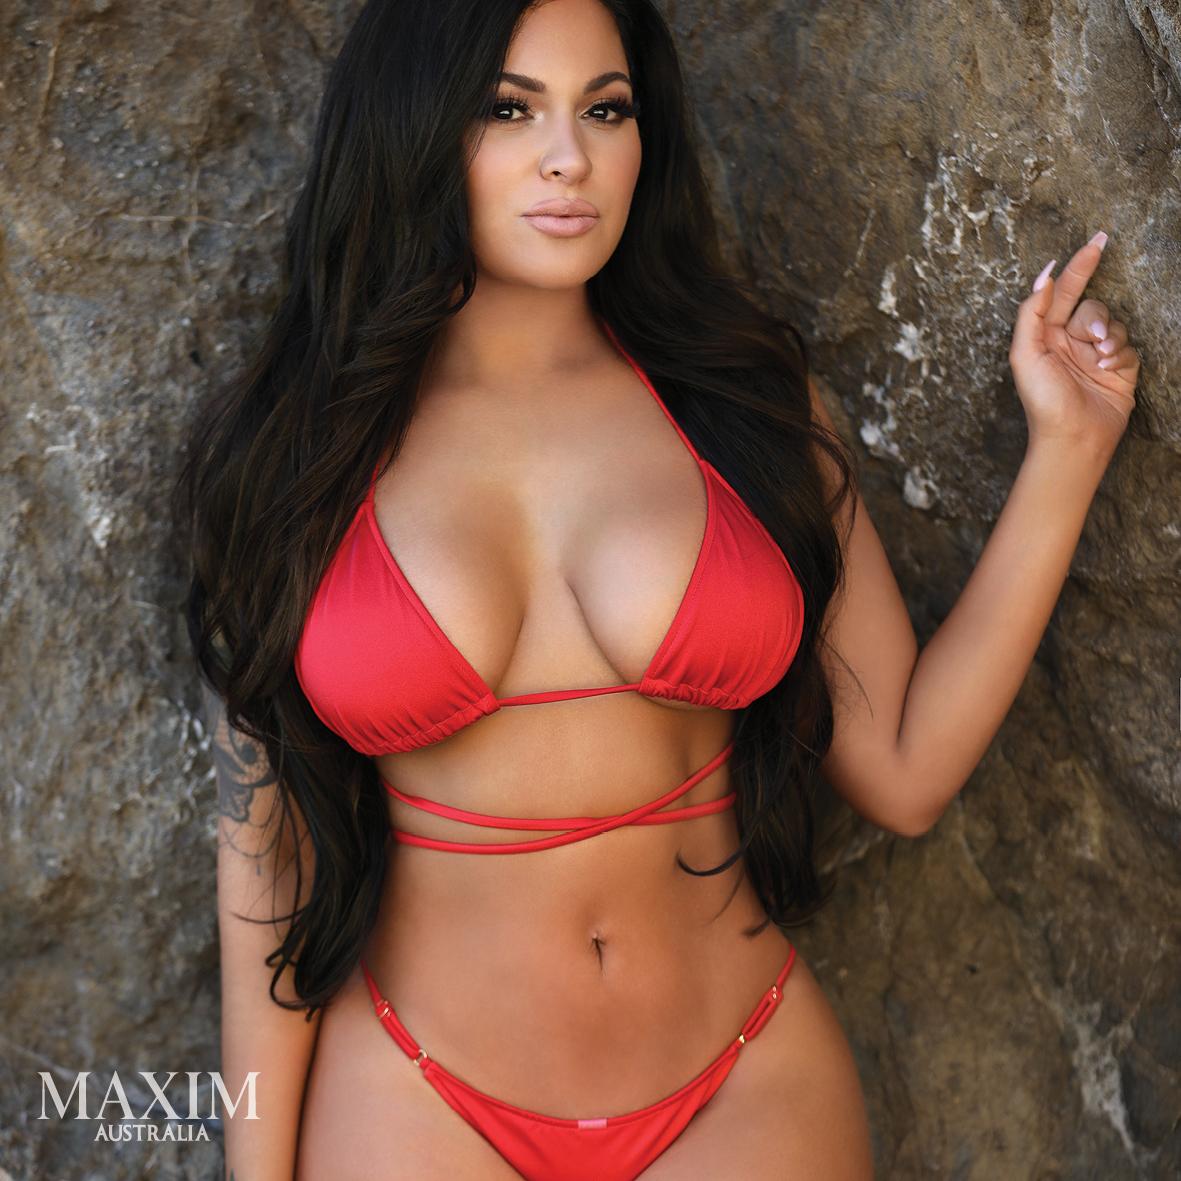 Maxim-Australia-Eliana-Brasil-2